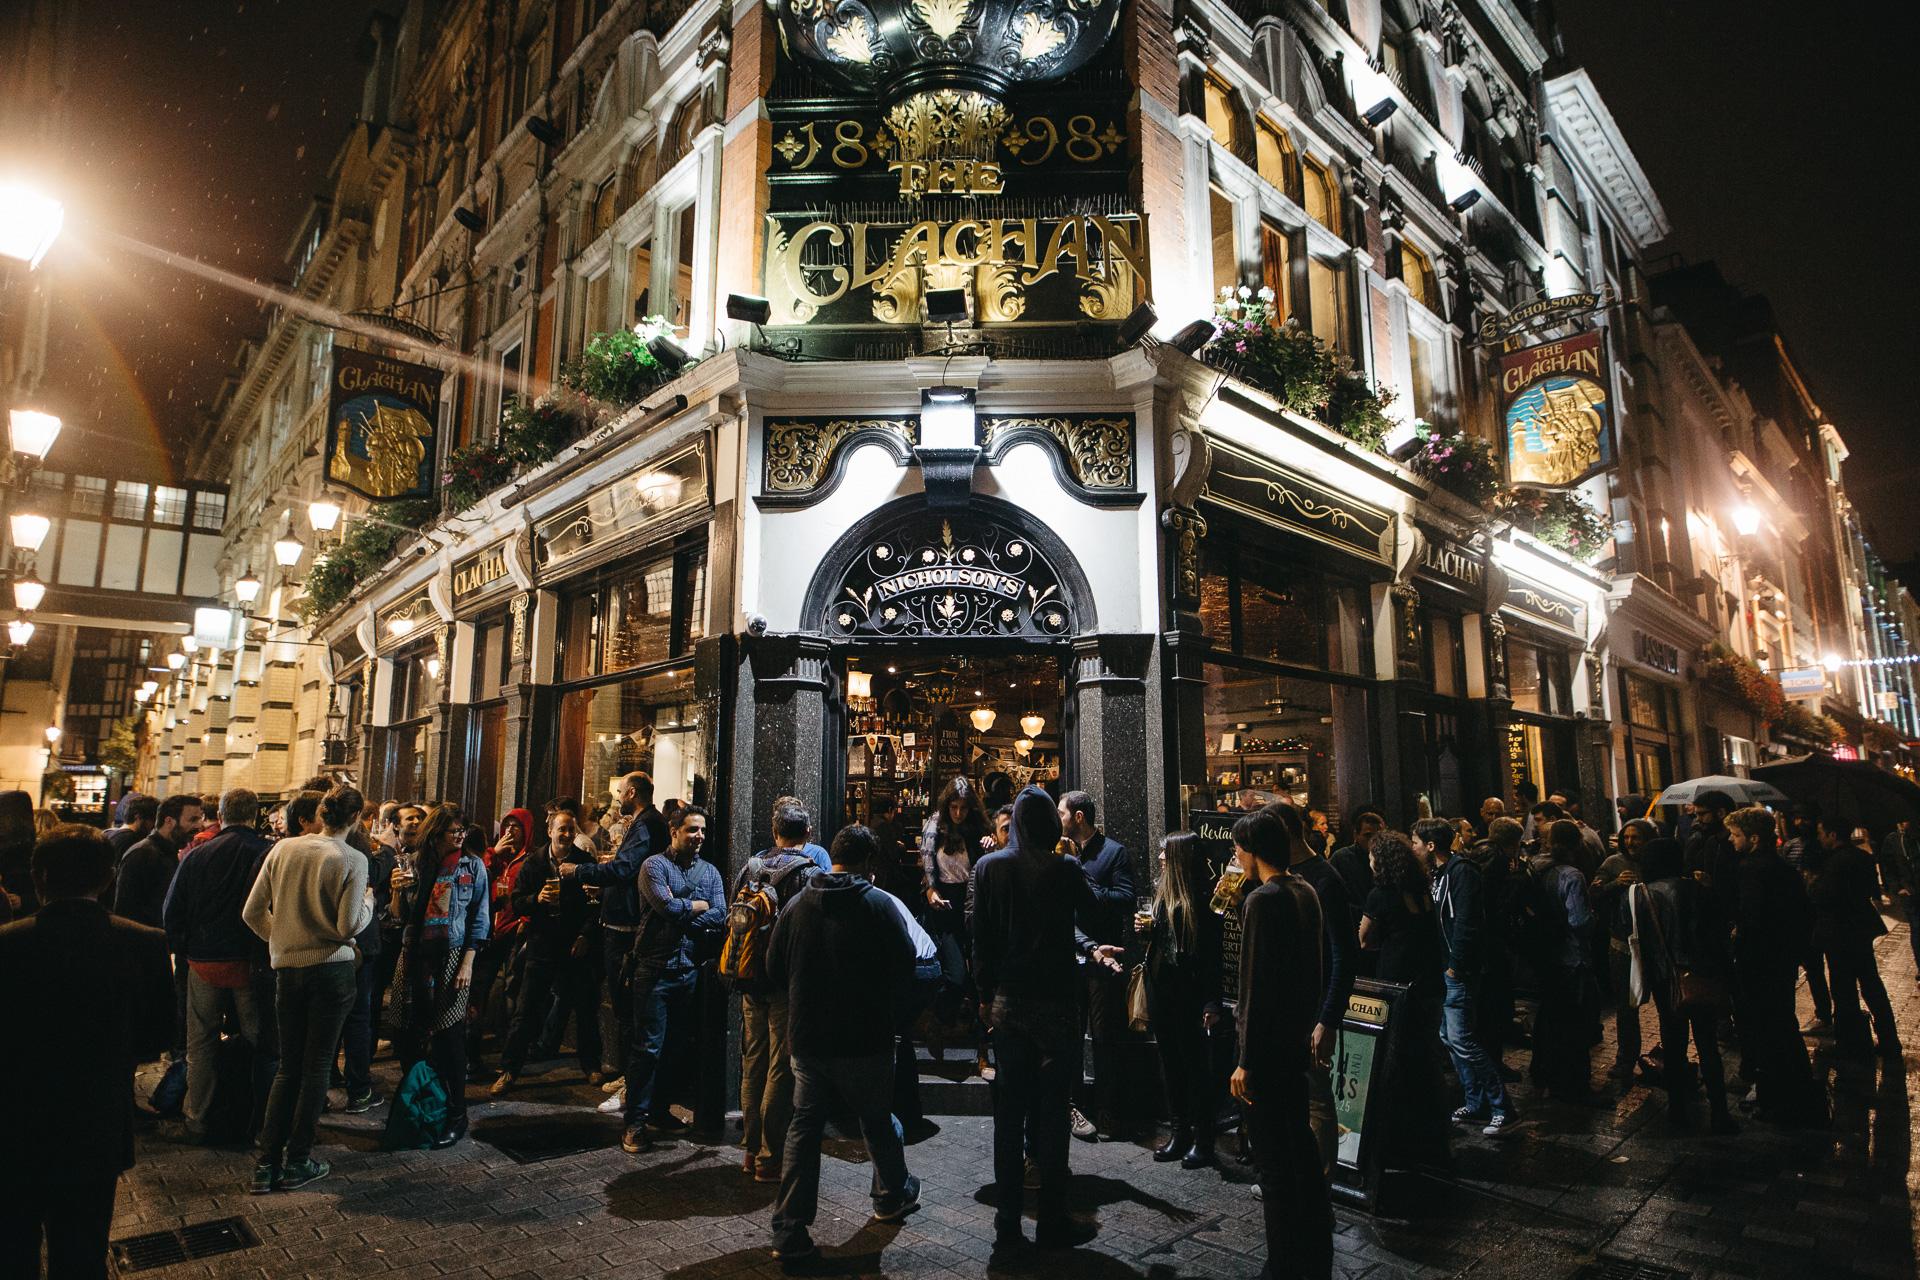 gabor_lenart_london_photographer_street_blogger_lifestyle_img_5161